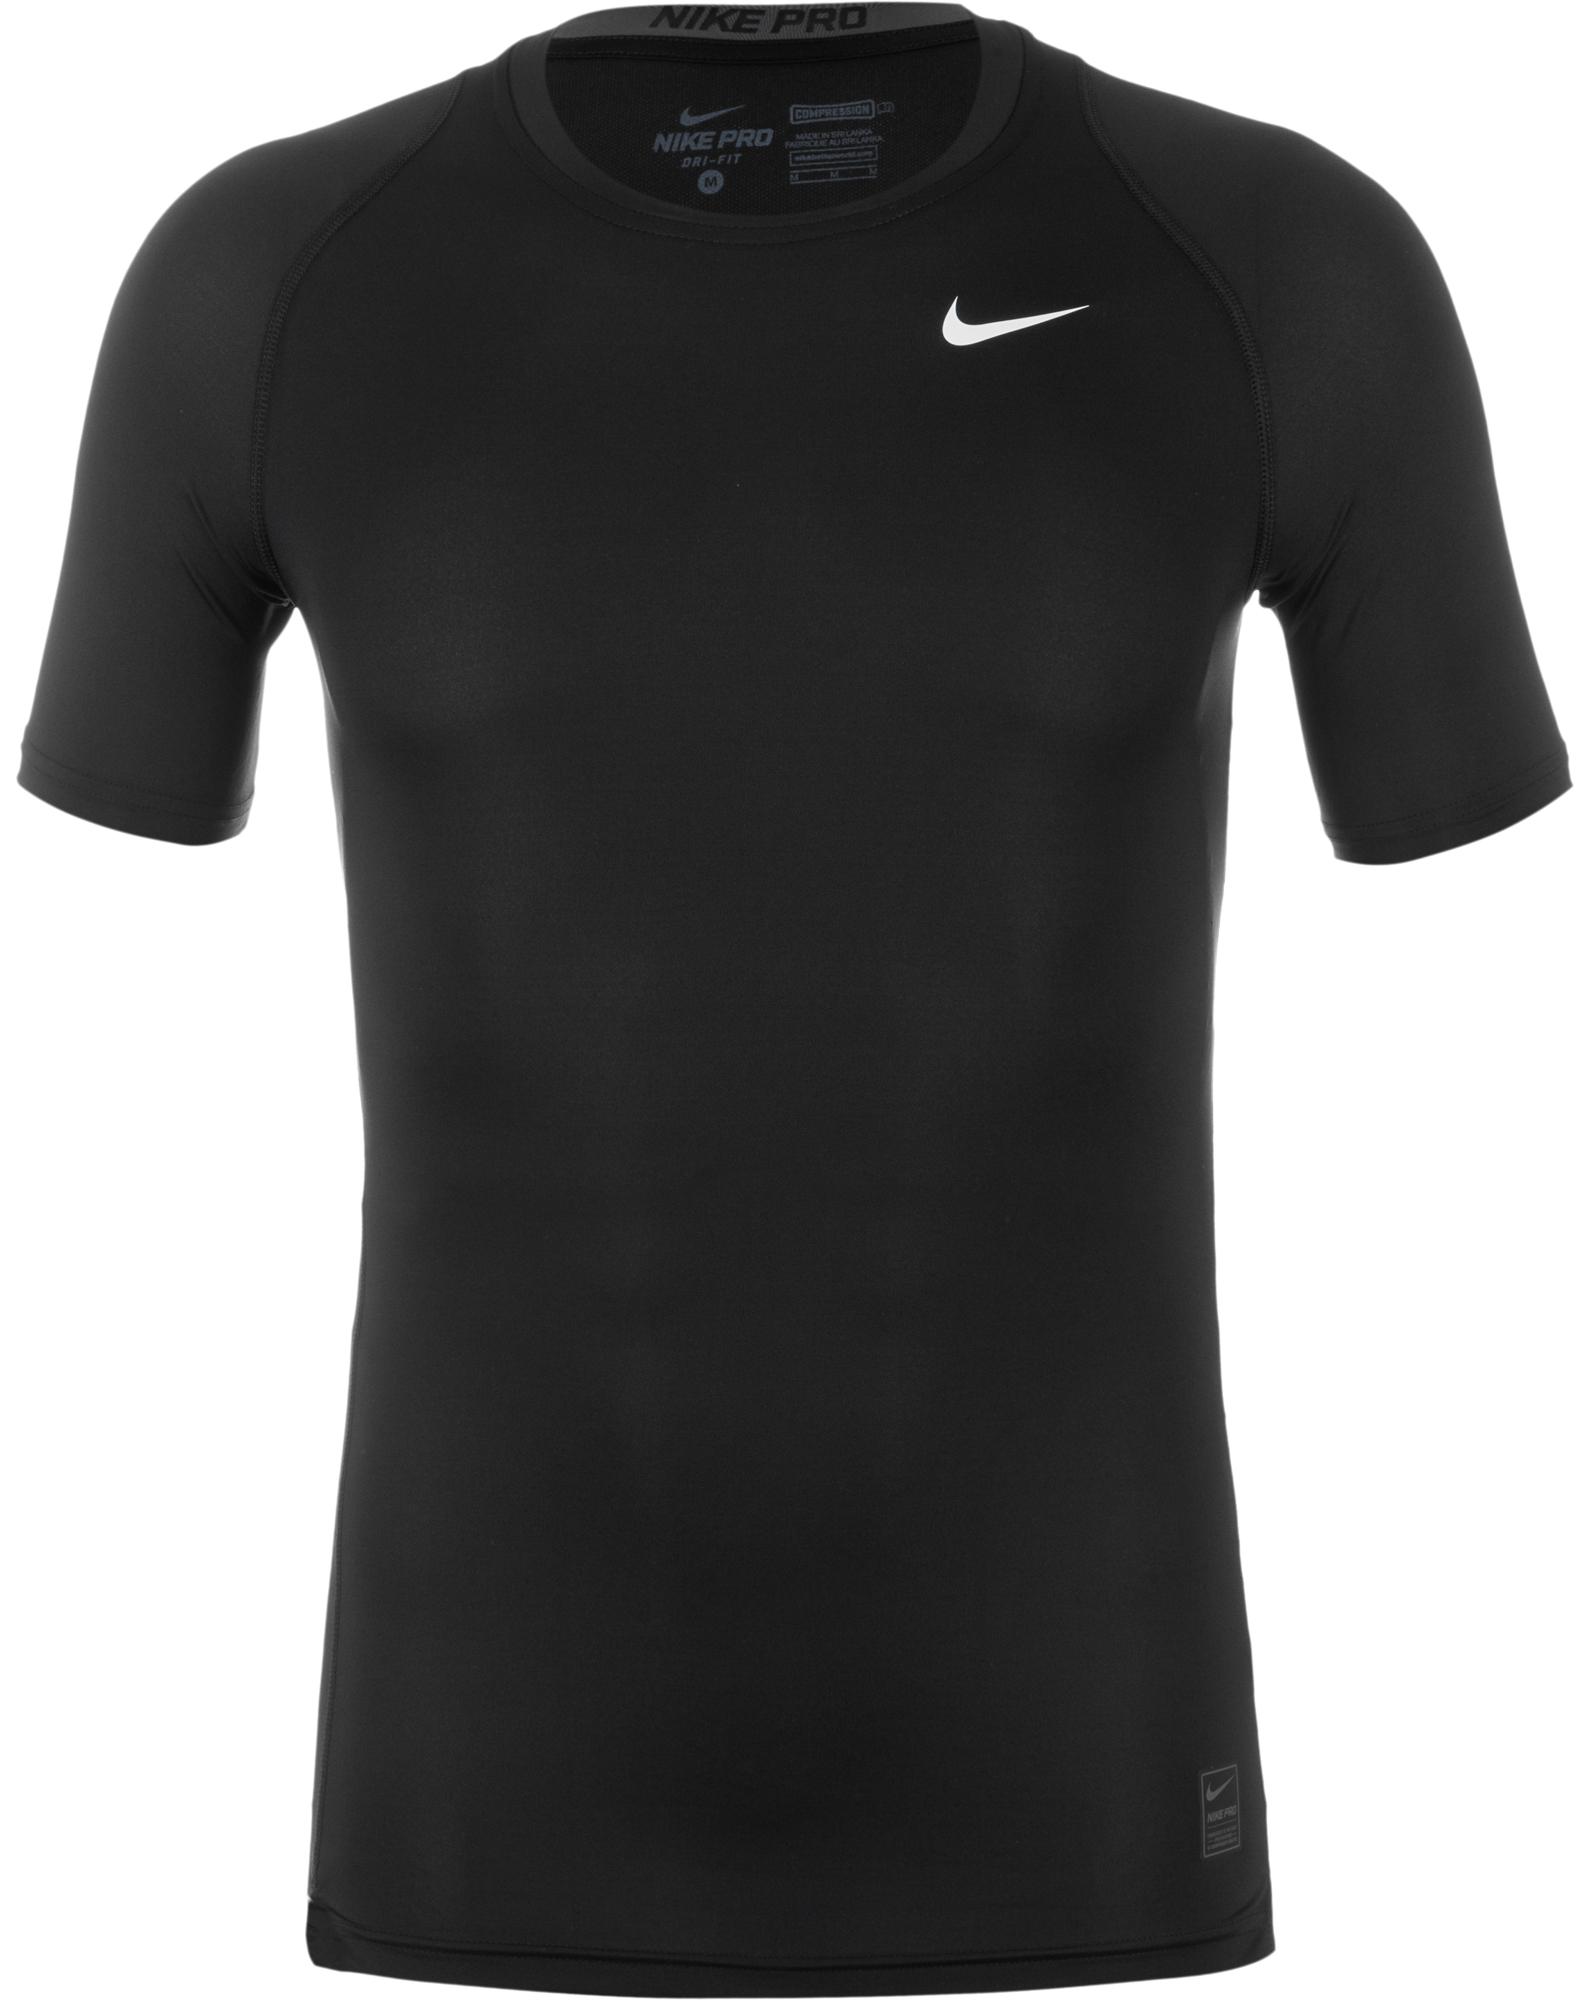 Nike Футболка мужская Nike Pro Cool Compression